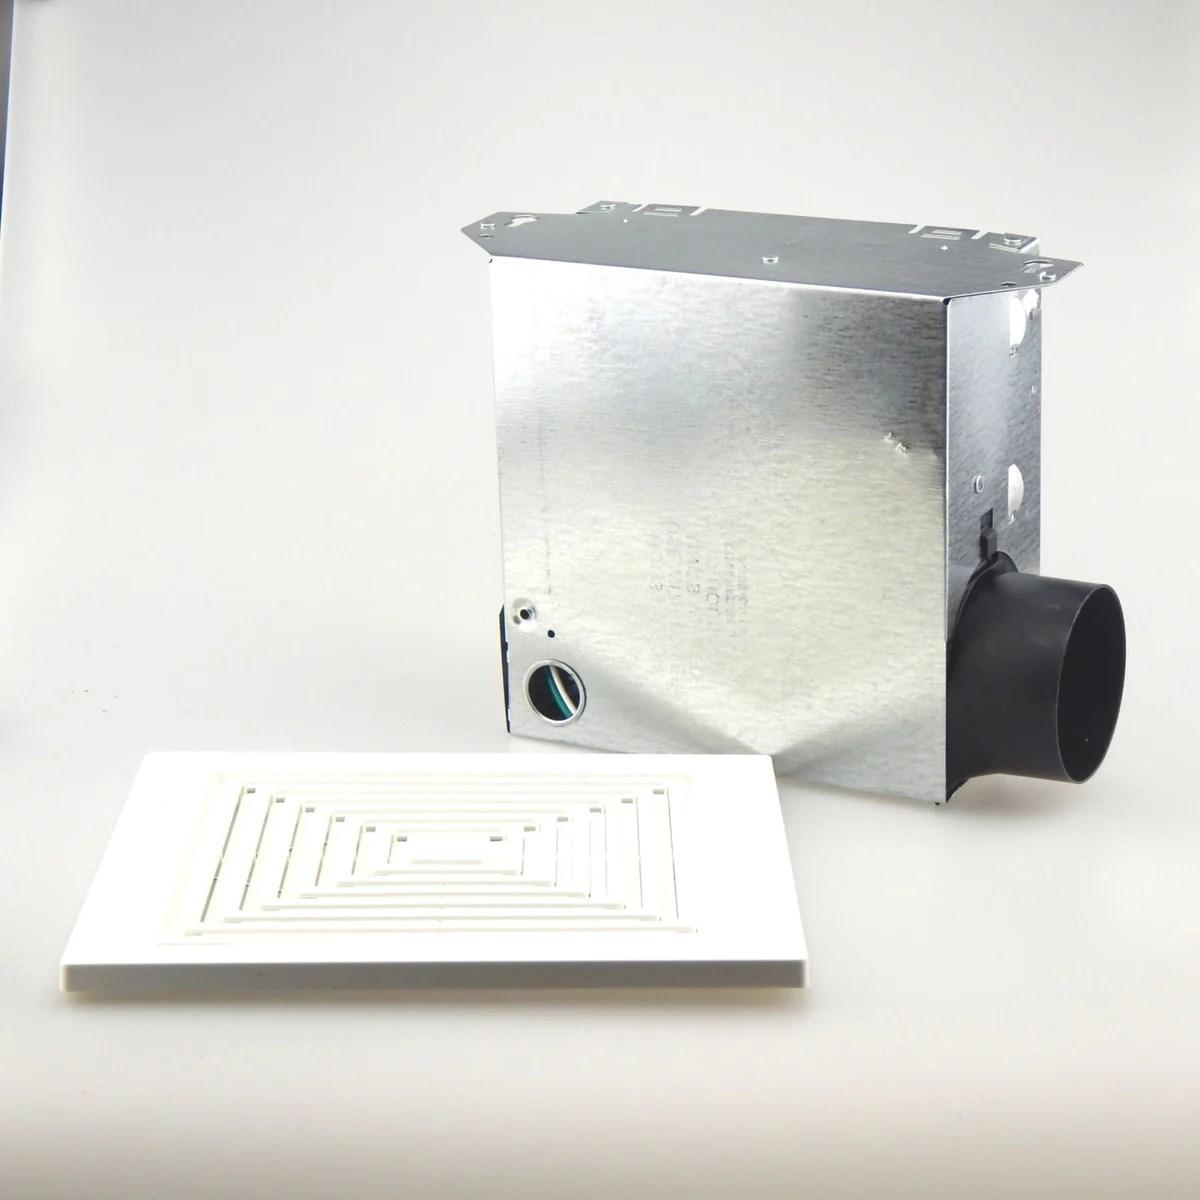 broan 688 ventilation fan 50 cfm 4 0 sones diy appliance hvac parts [ 1200 x 1200 Pixel ]